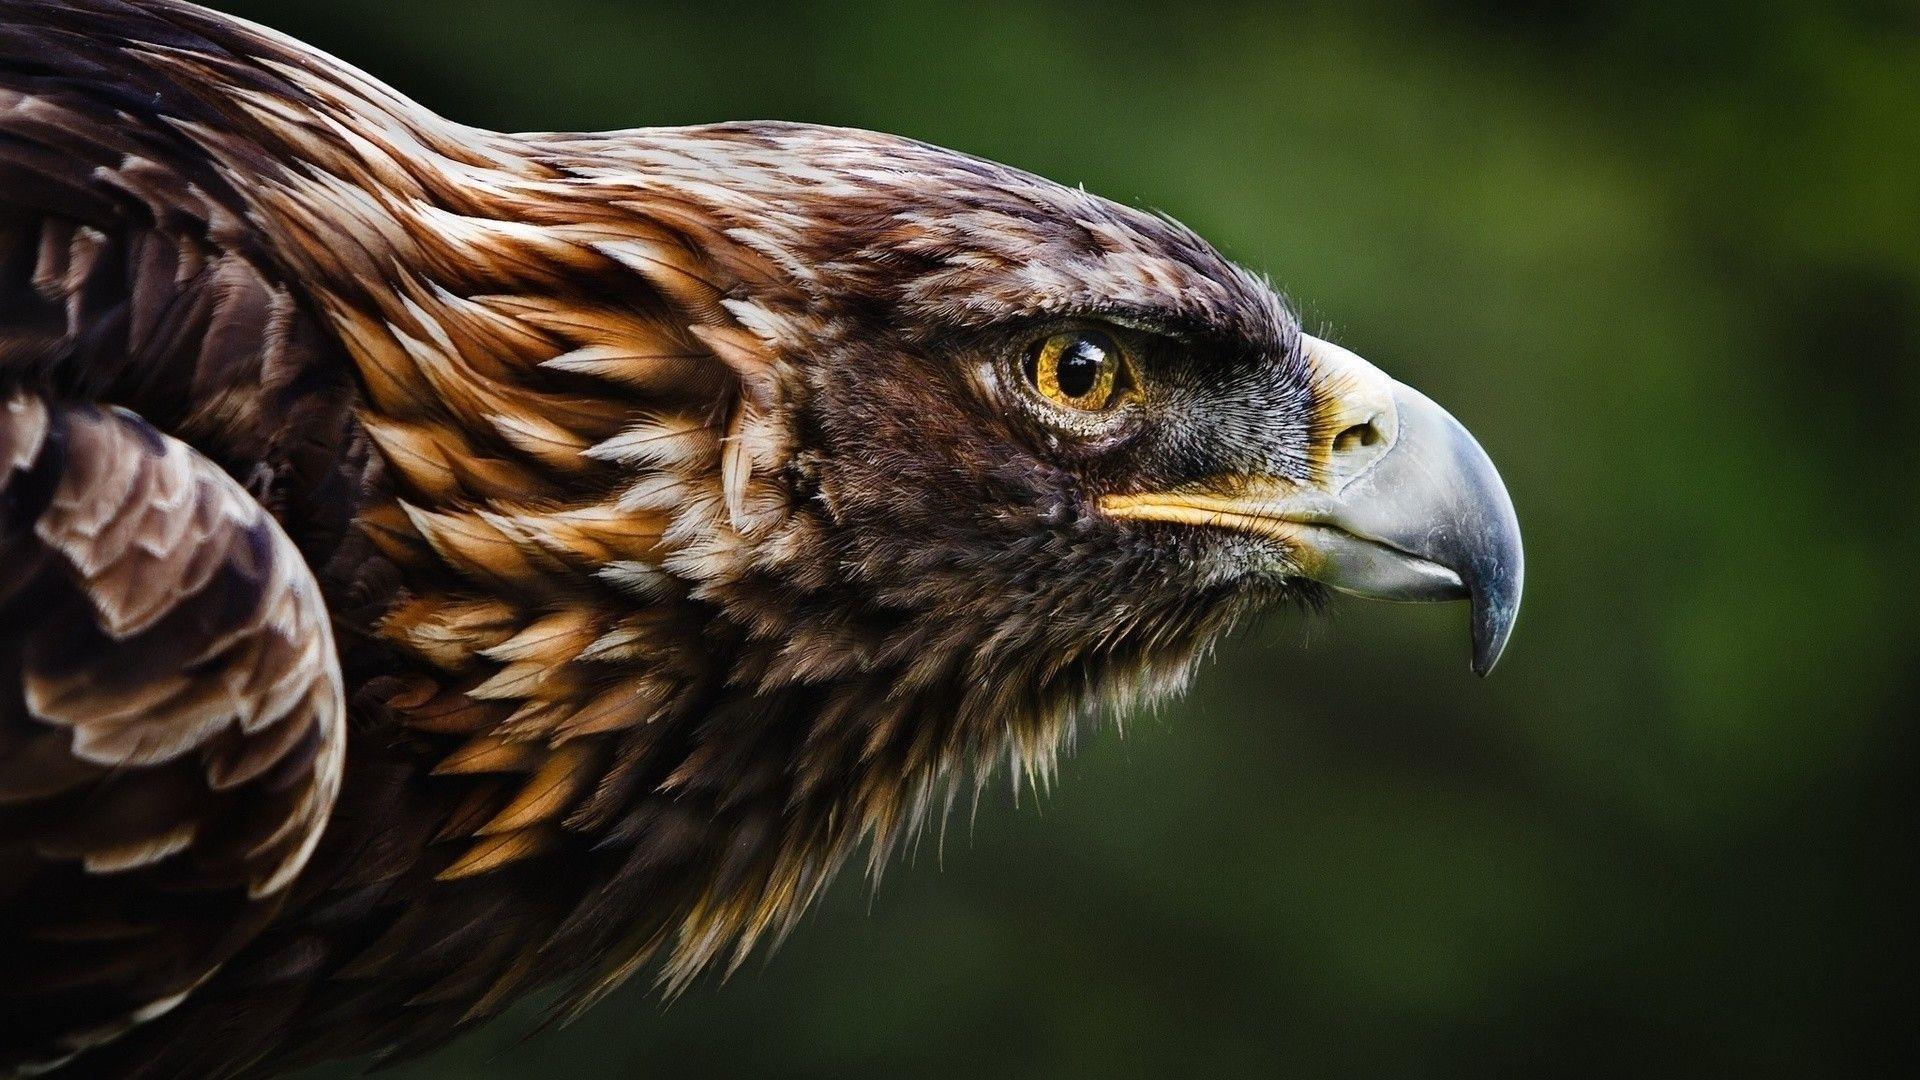 Eagles 4K Ultra HD Wallpapers - Top Free Eagles 4K Ultra ...